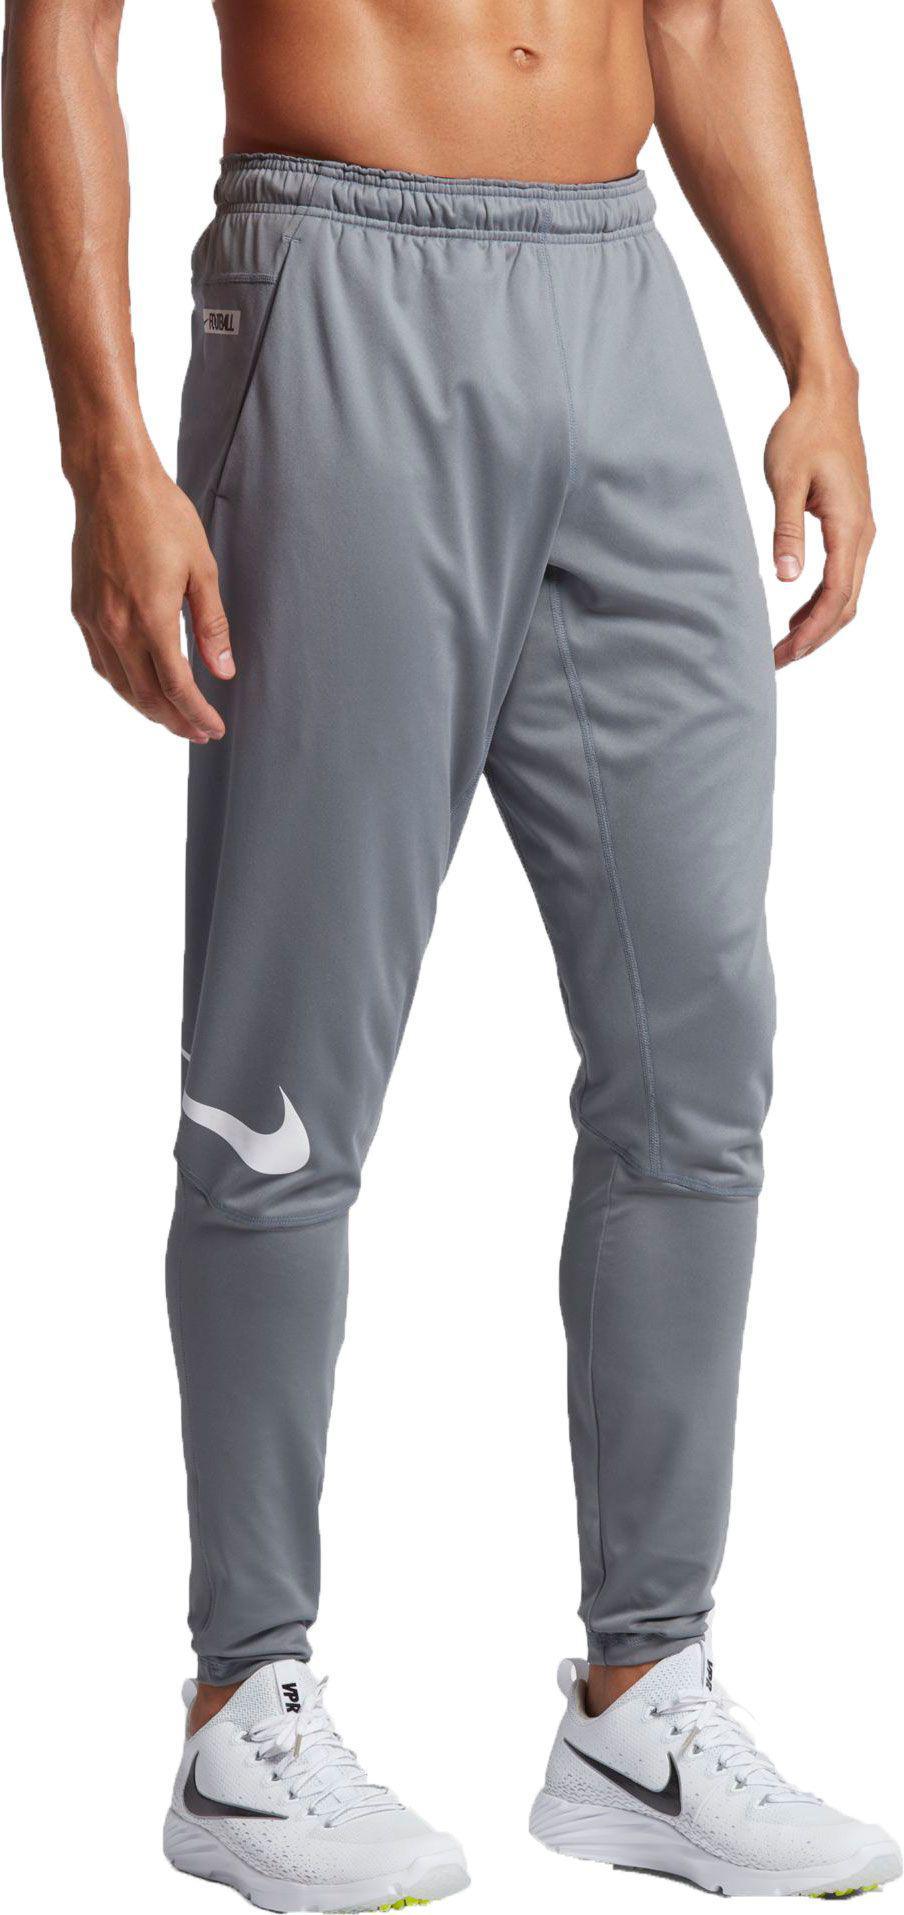 6c41b7089c5d Lyst - Nike Dry Practice Football Pants in Gray for Men